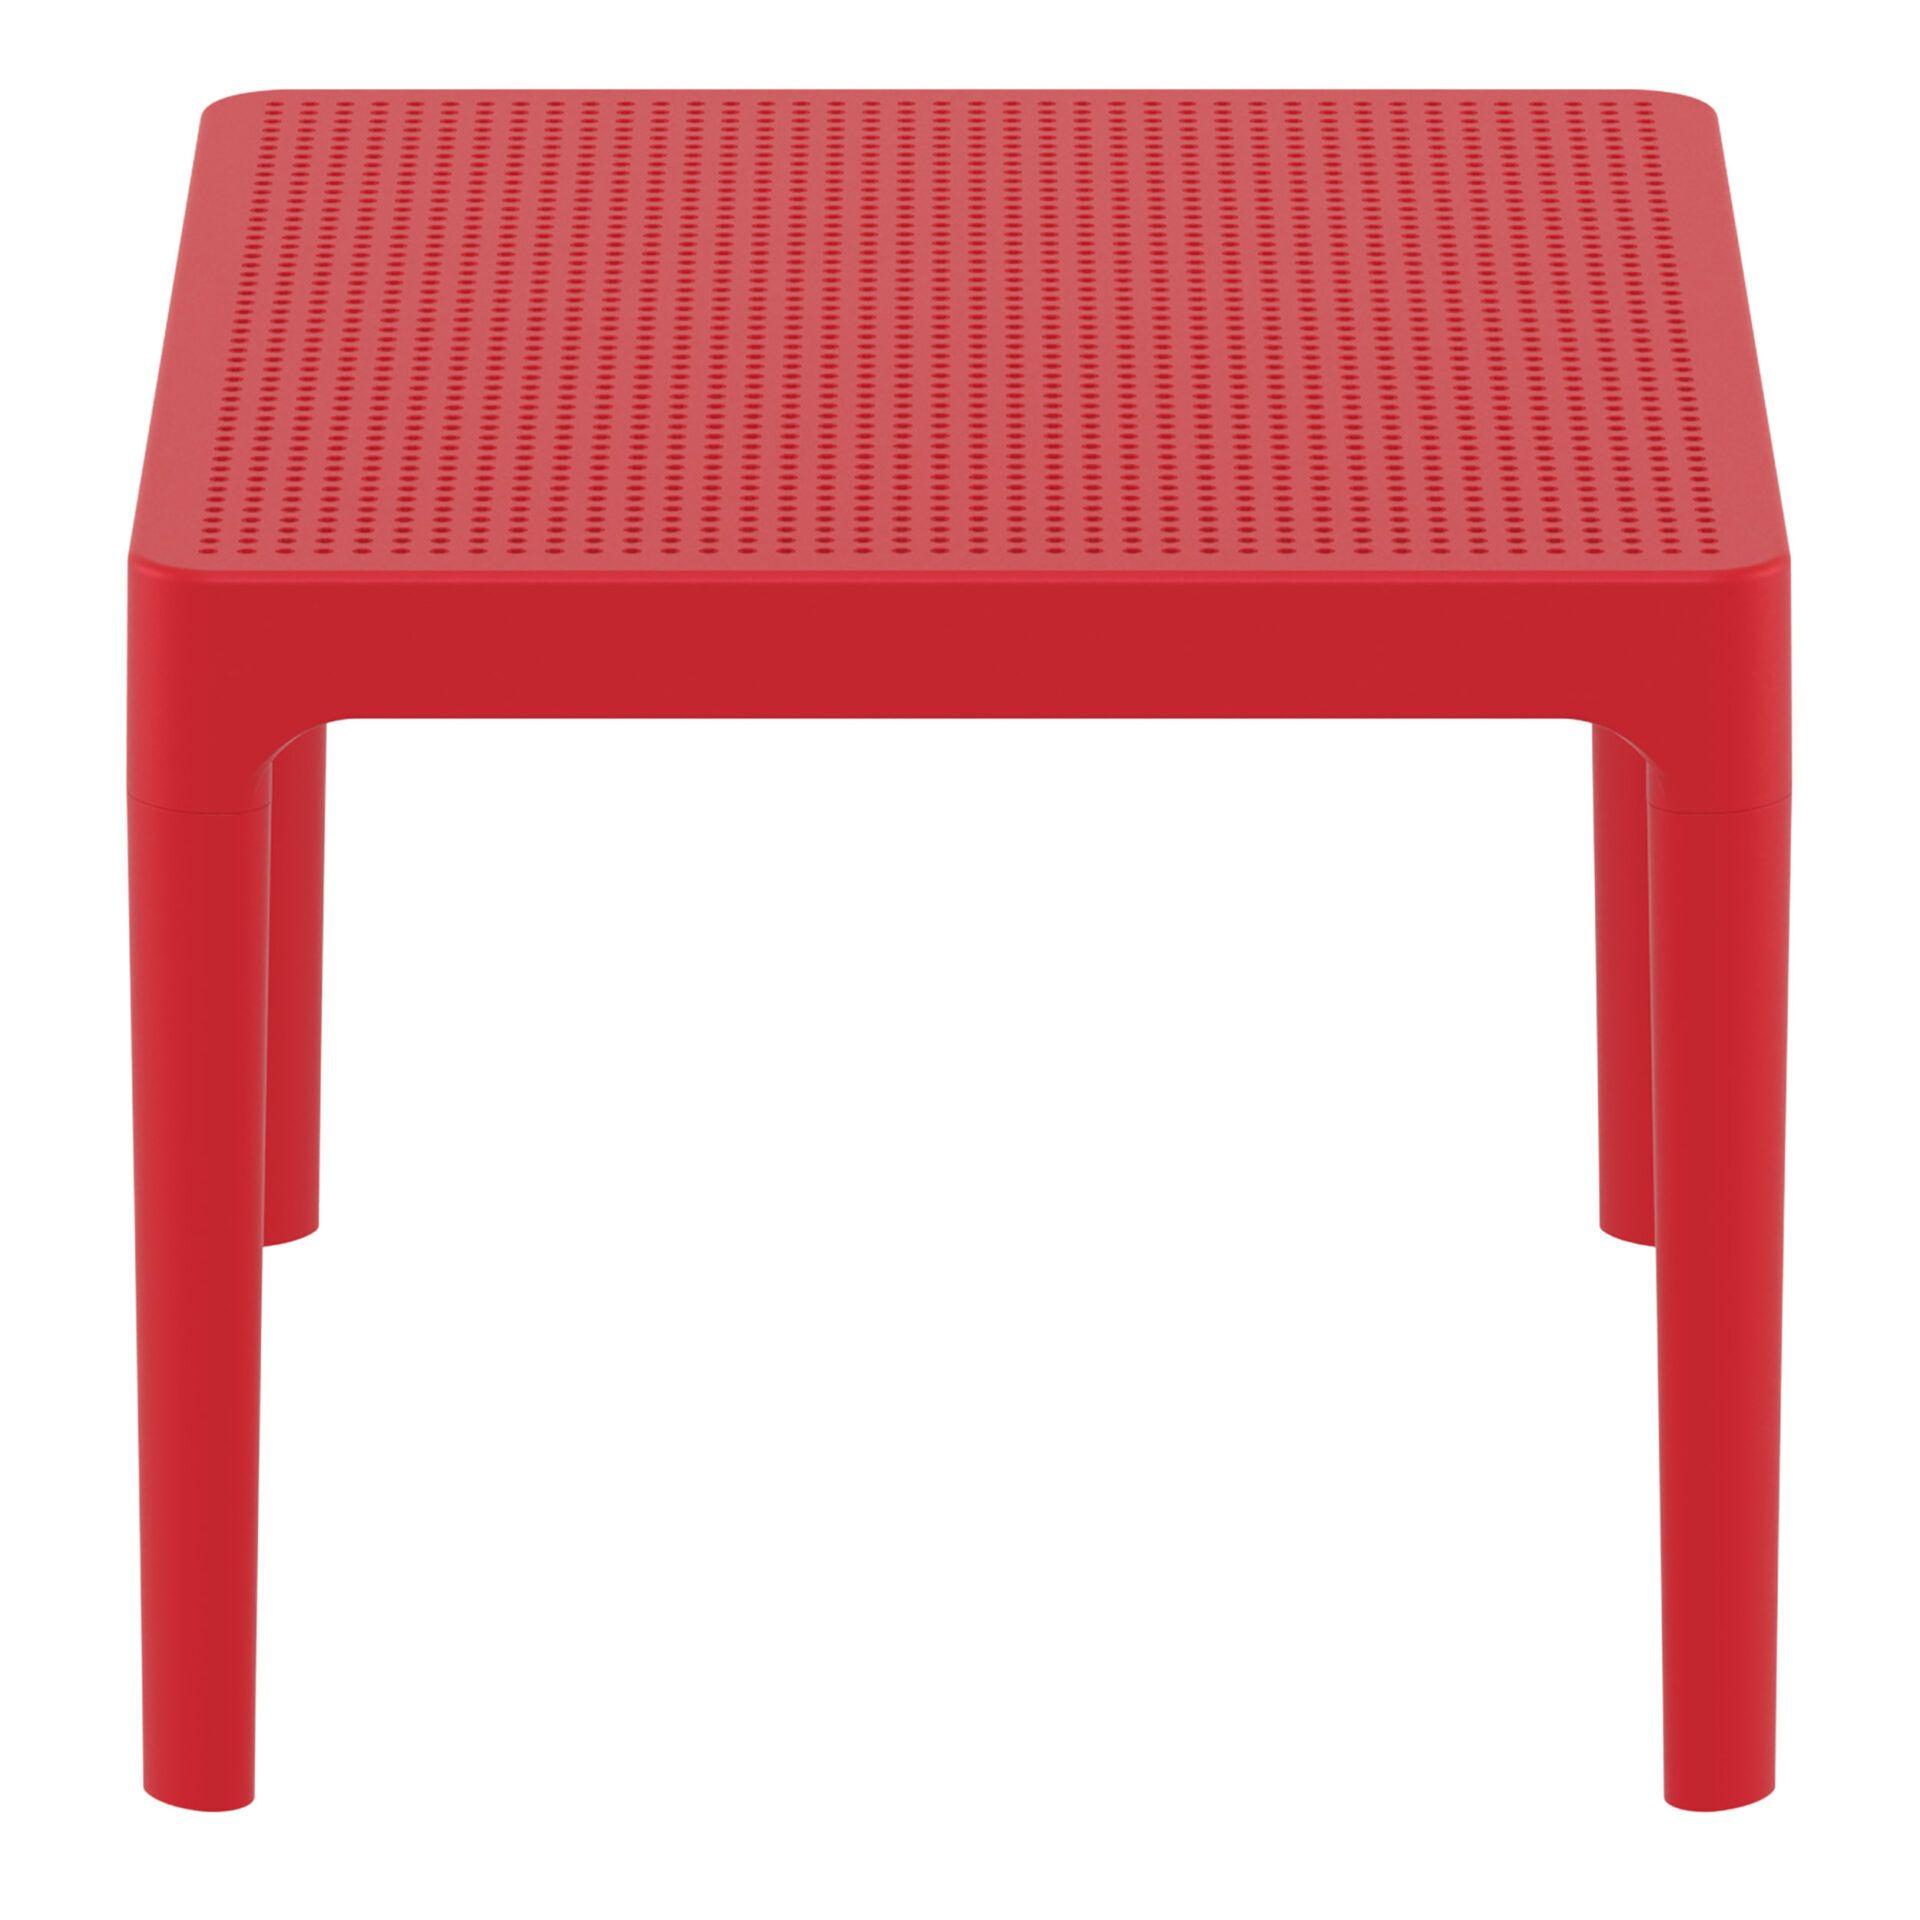 polypropylene outdoor sky side table red short edge